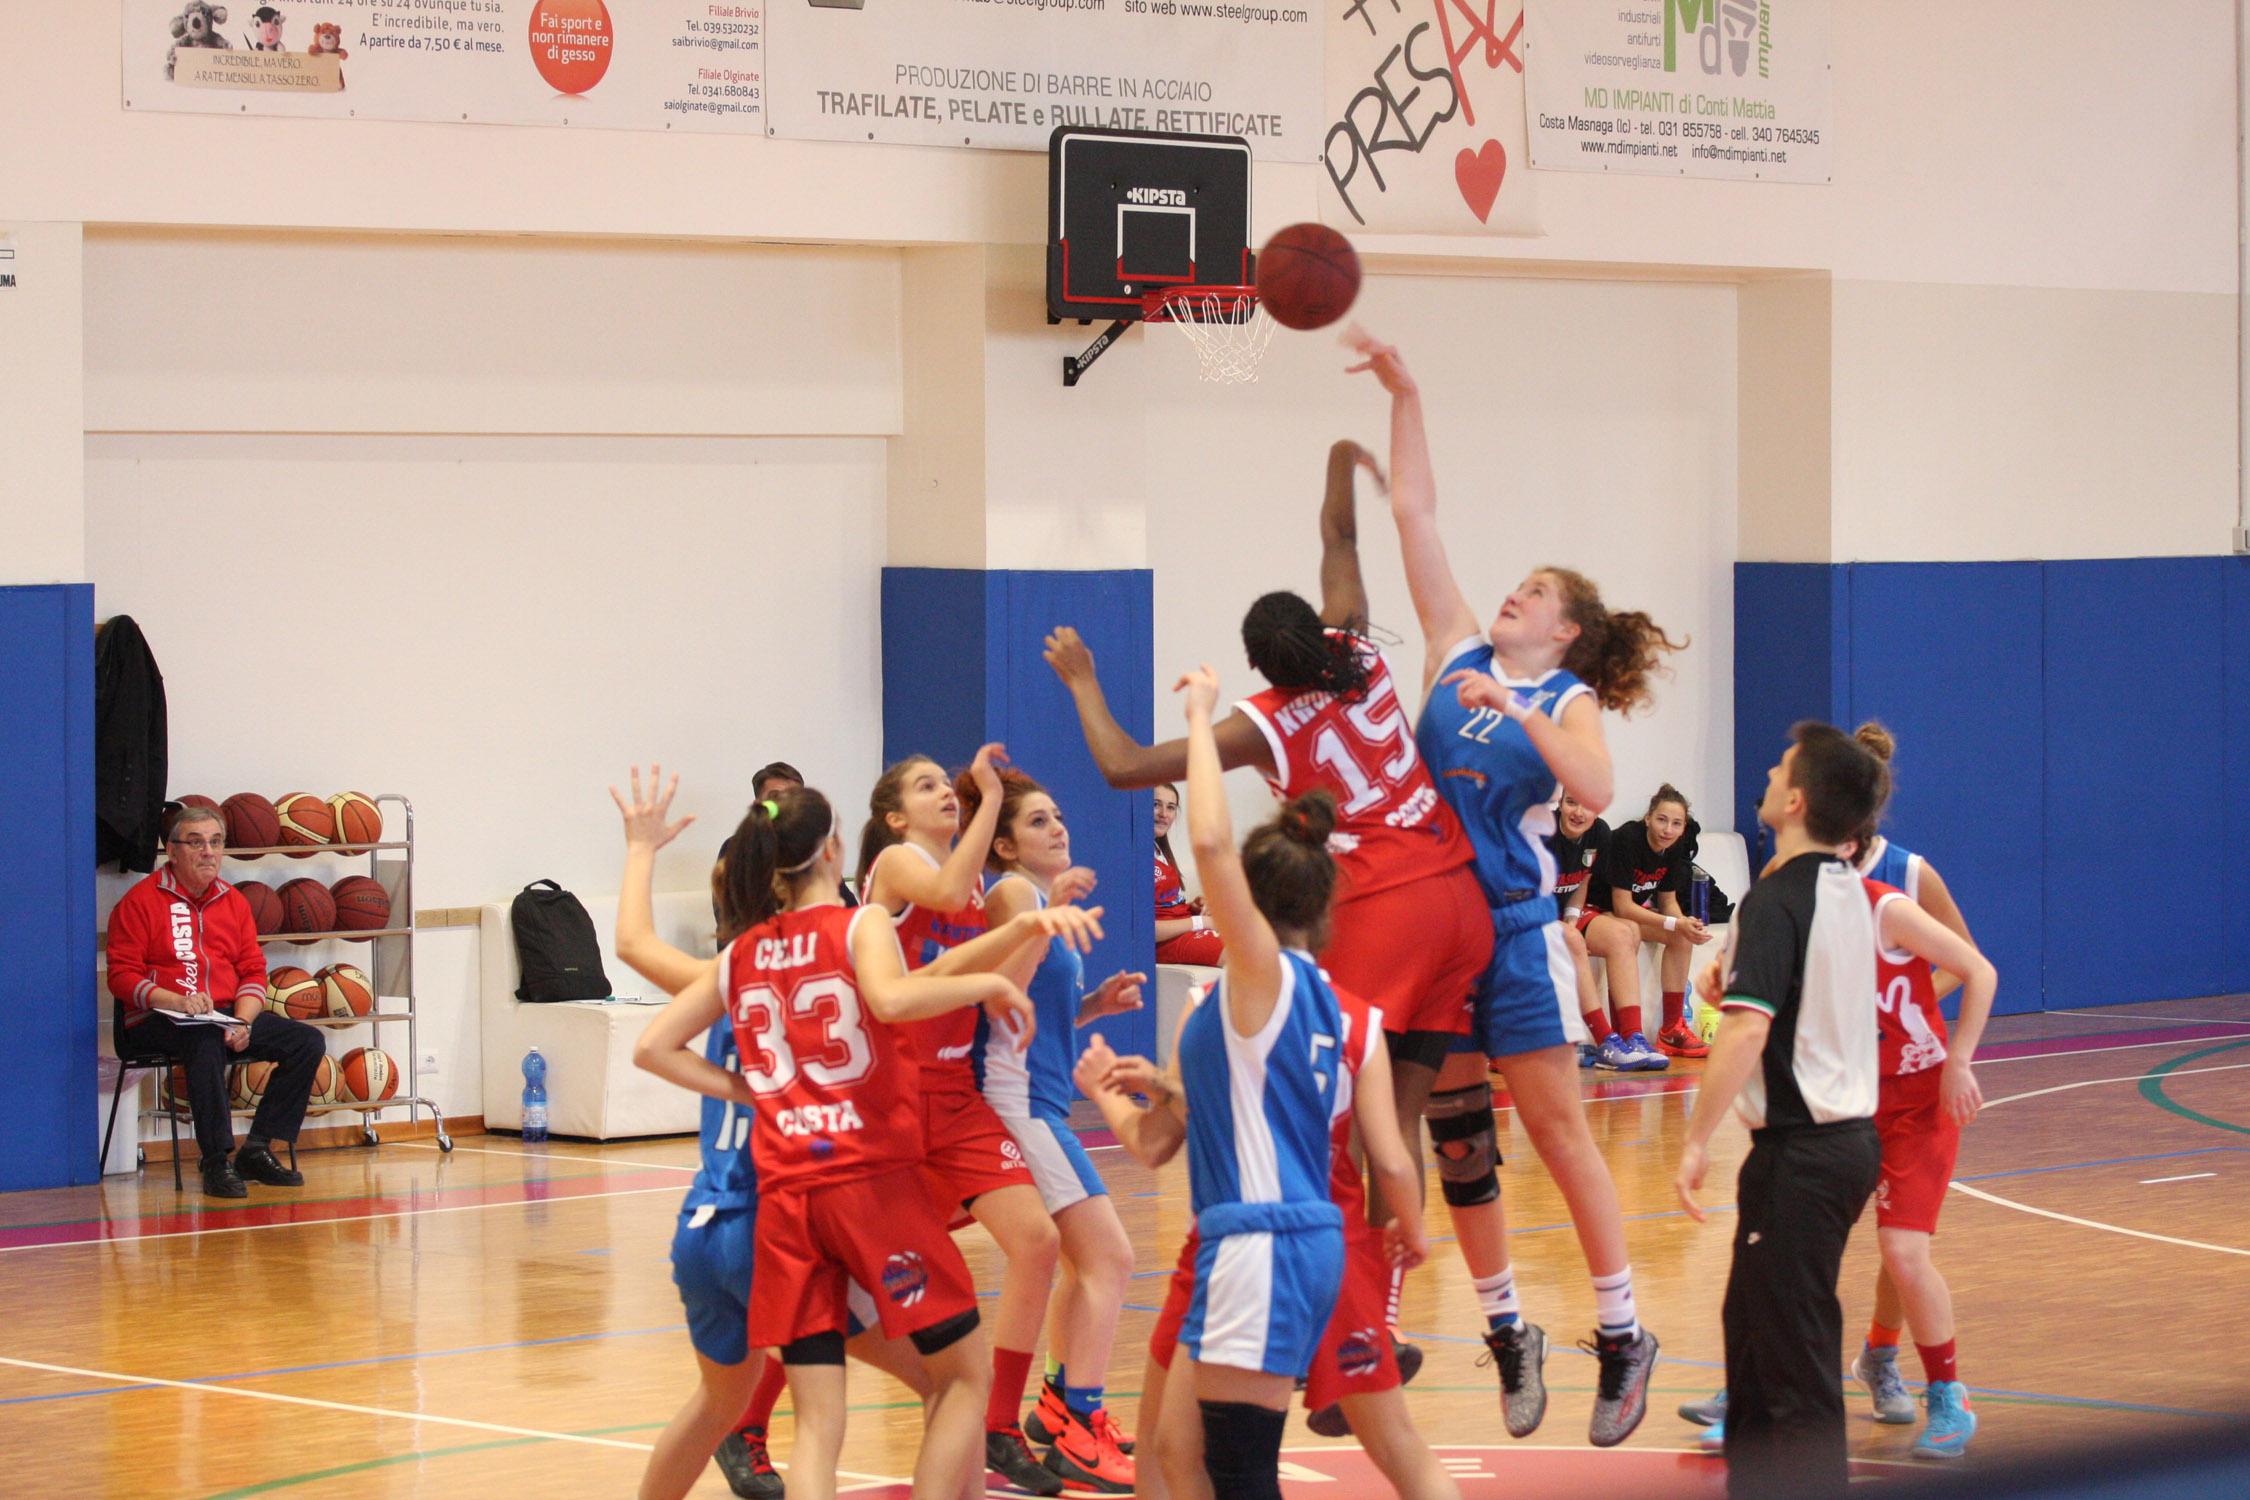 U16E - Costa Masnaga vs Baskettiamo Vittuone 2001 00002.jpg